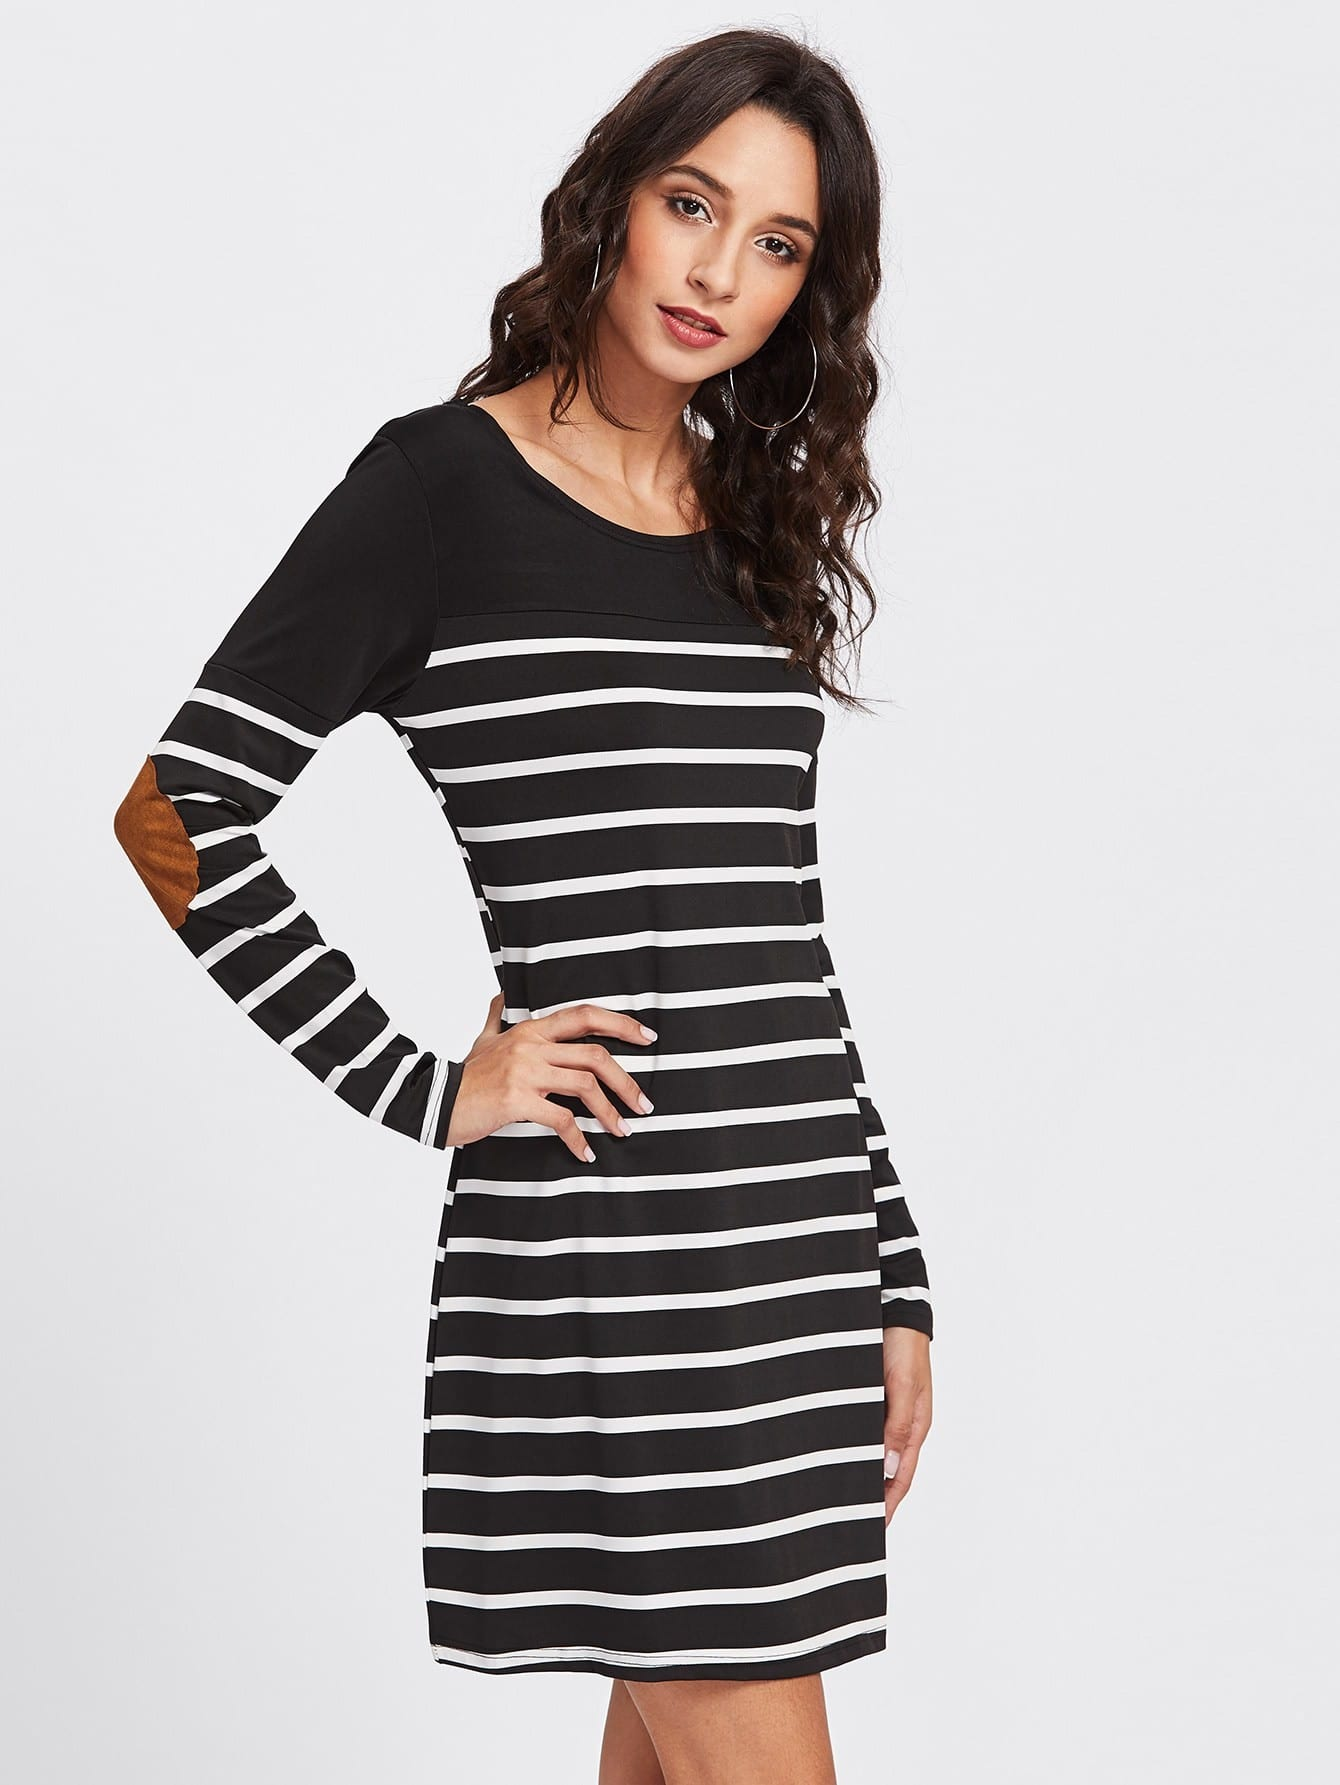 Elbow Patch Striped Tee Dress dress171023182